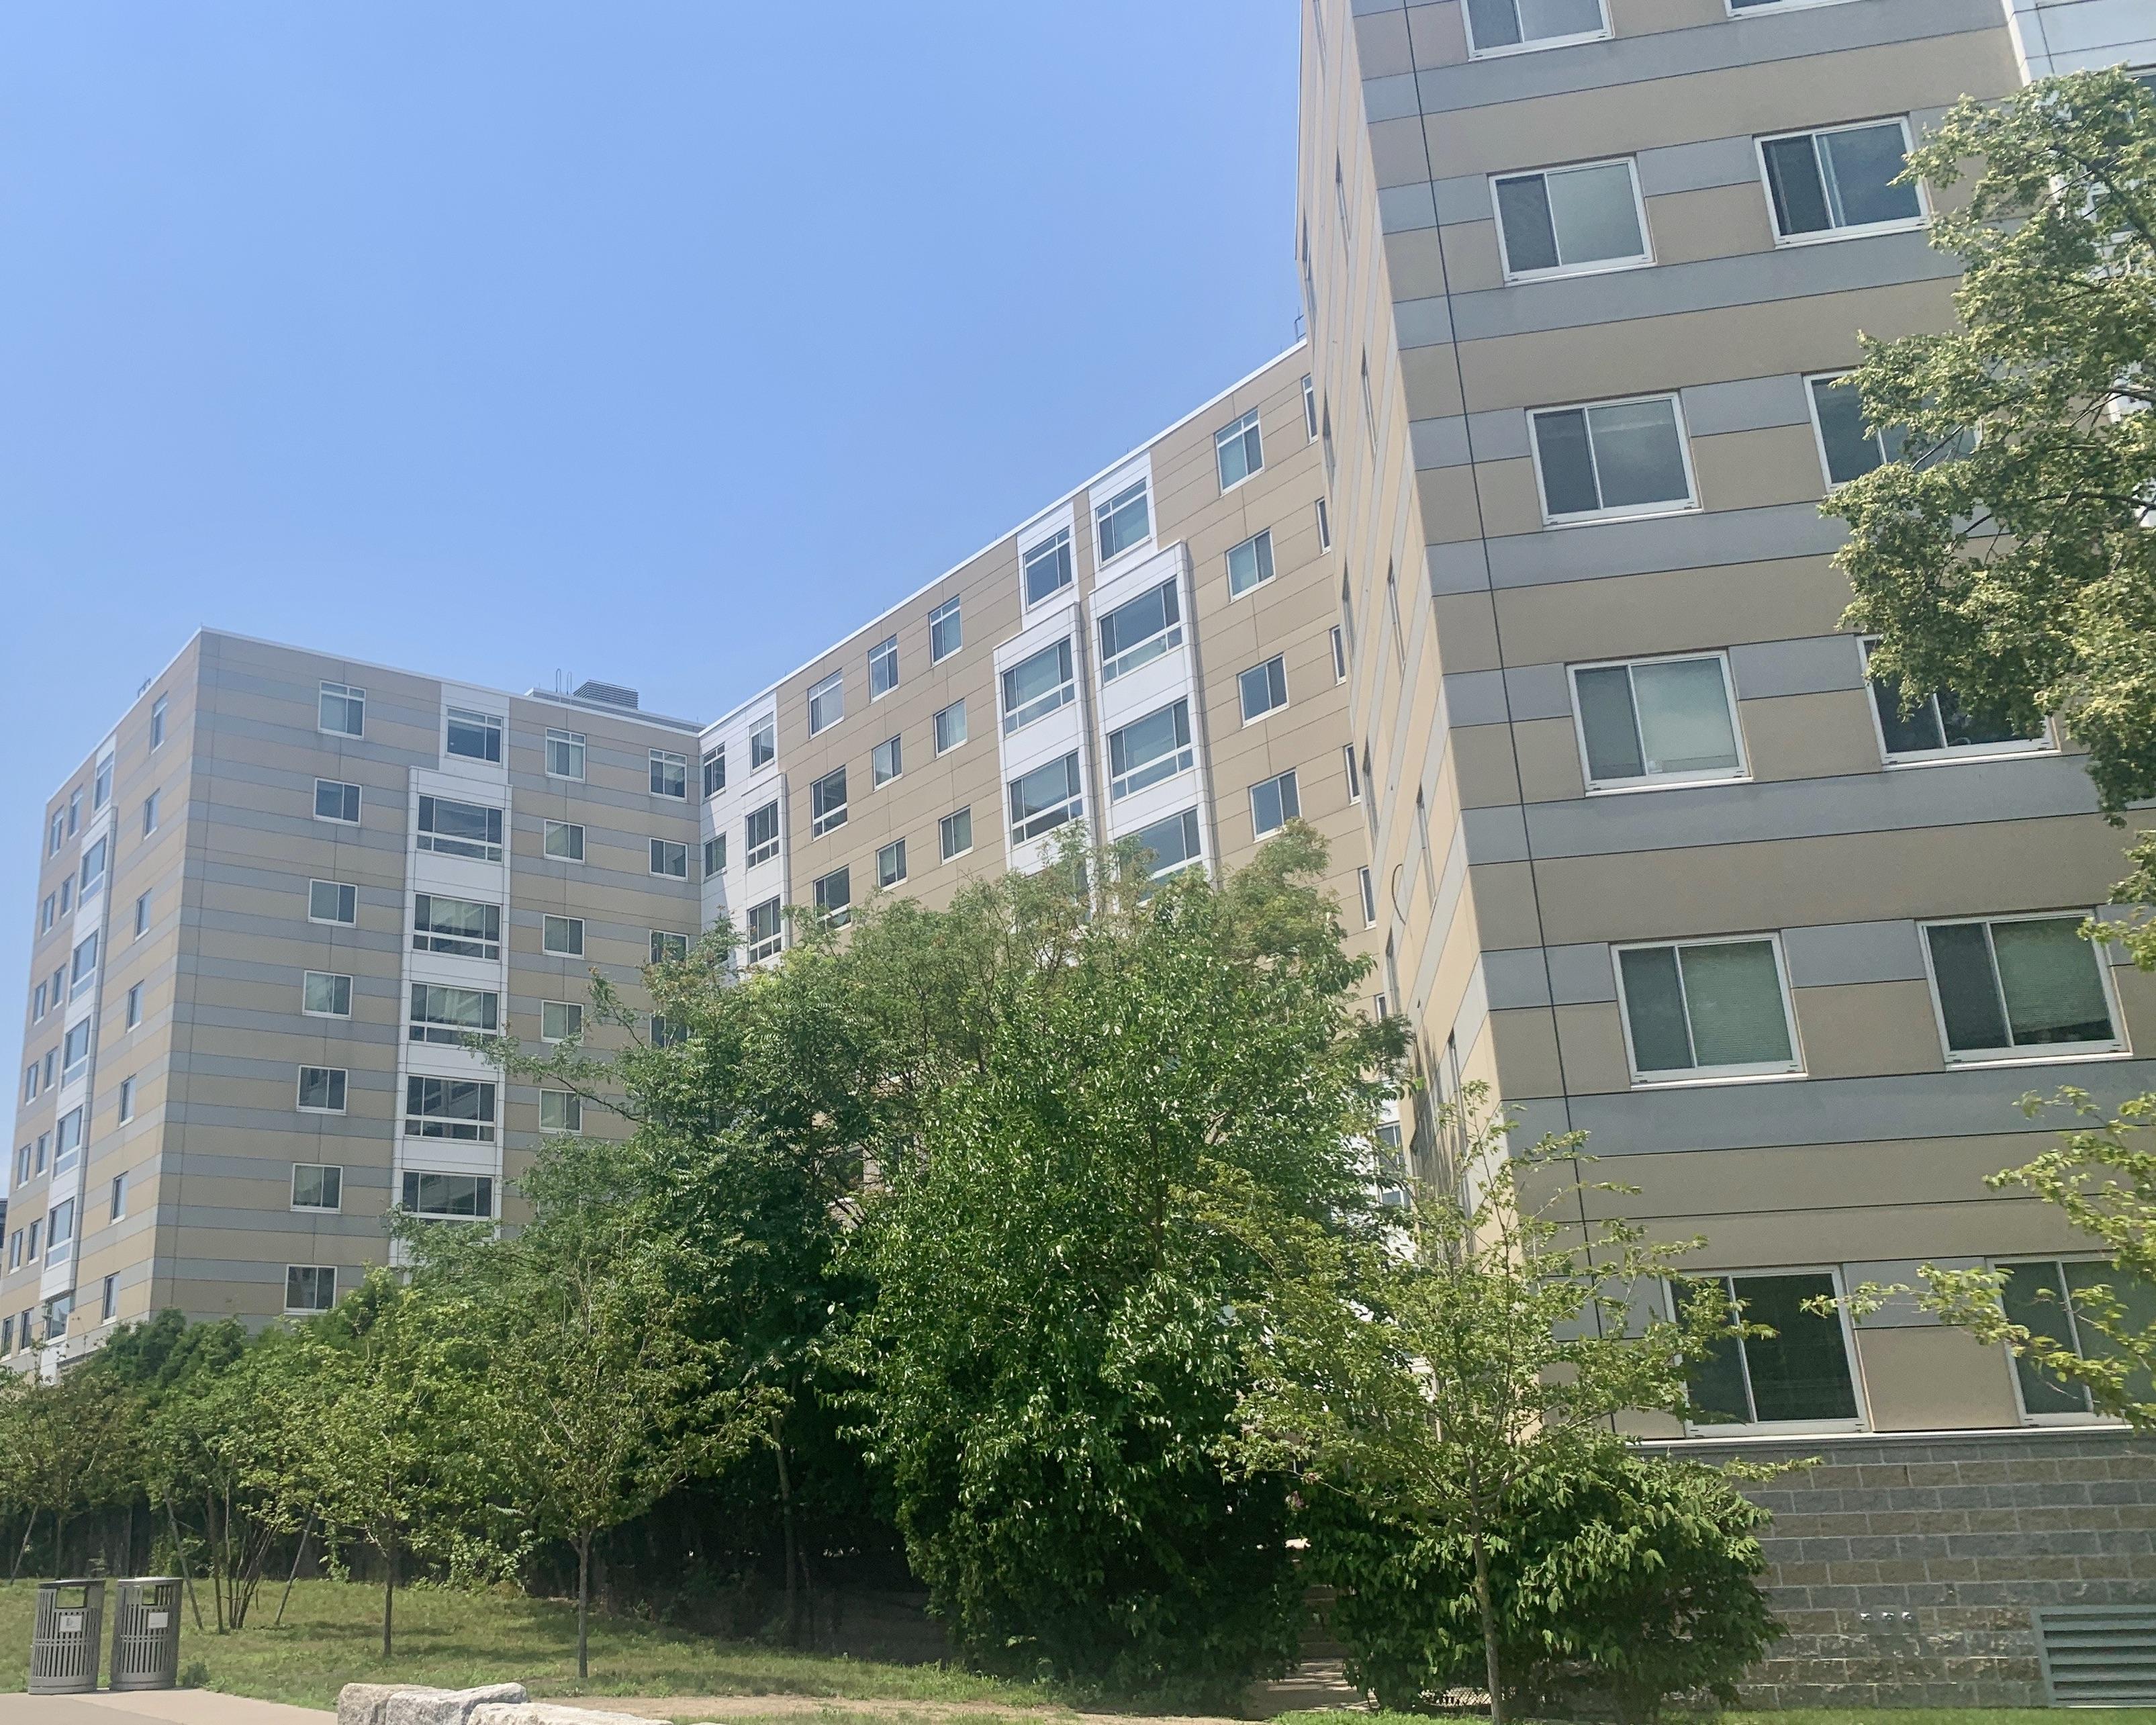 Peninsula Apartments on Mt Vernon Street, Dorchester